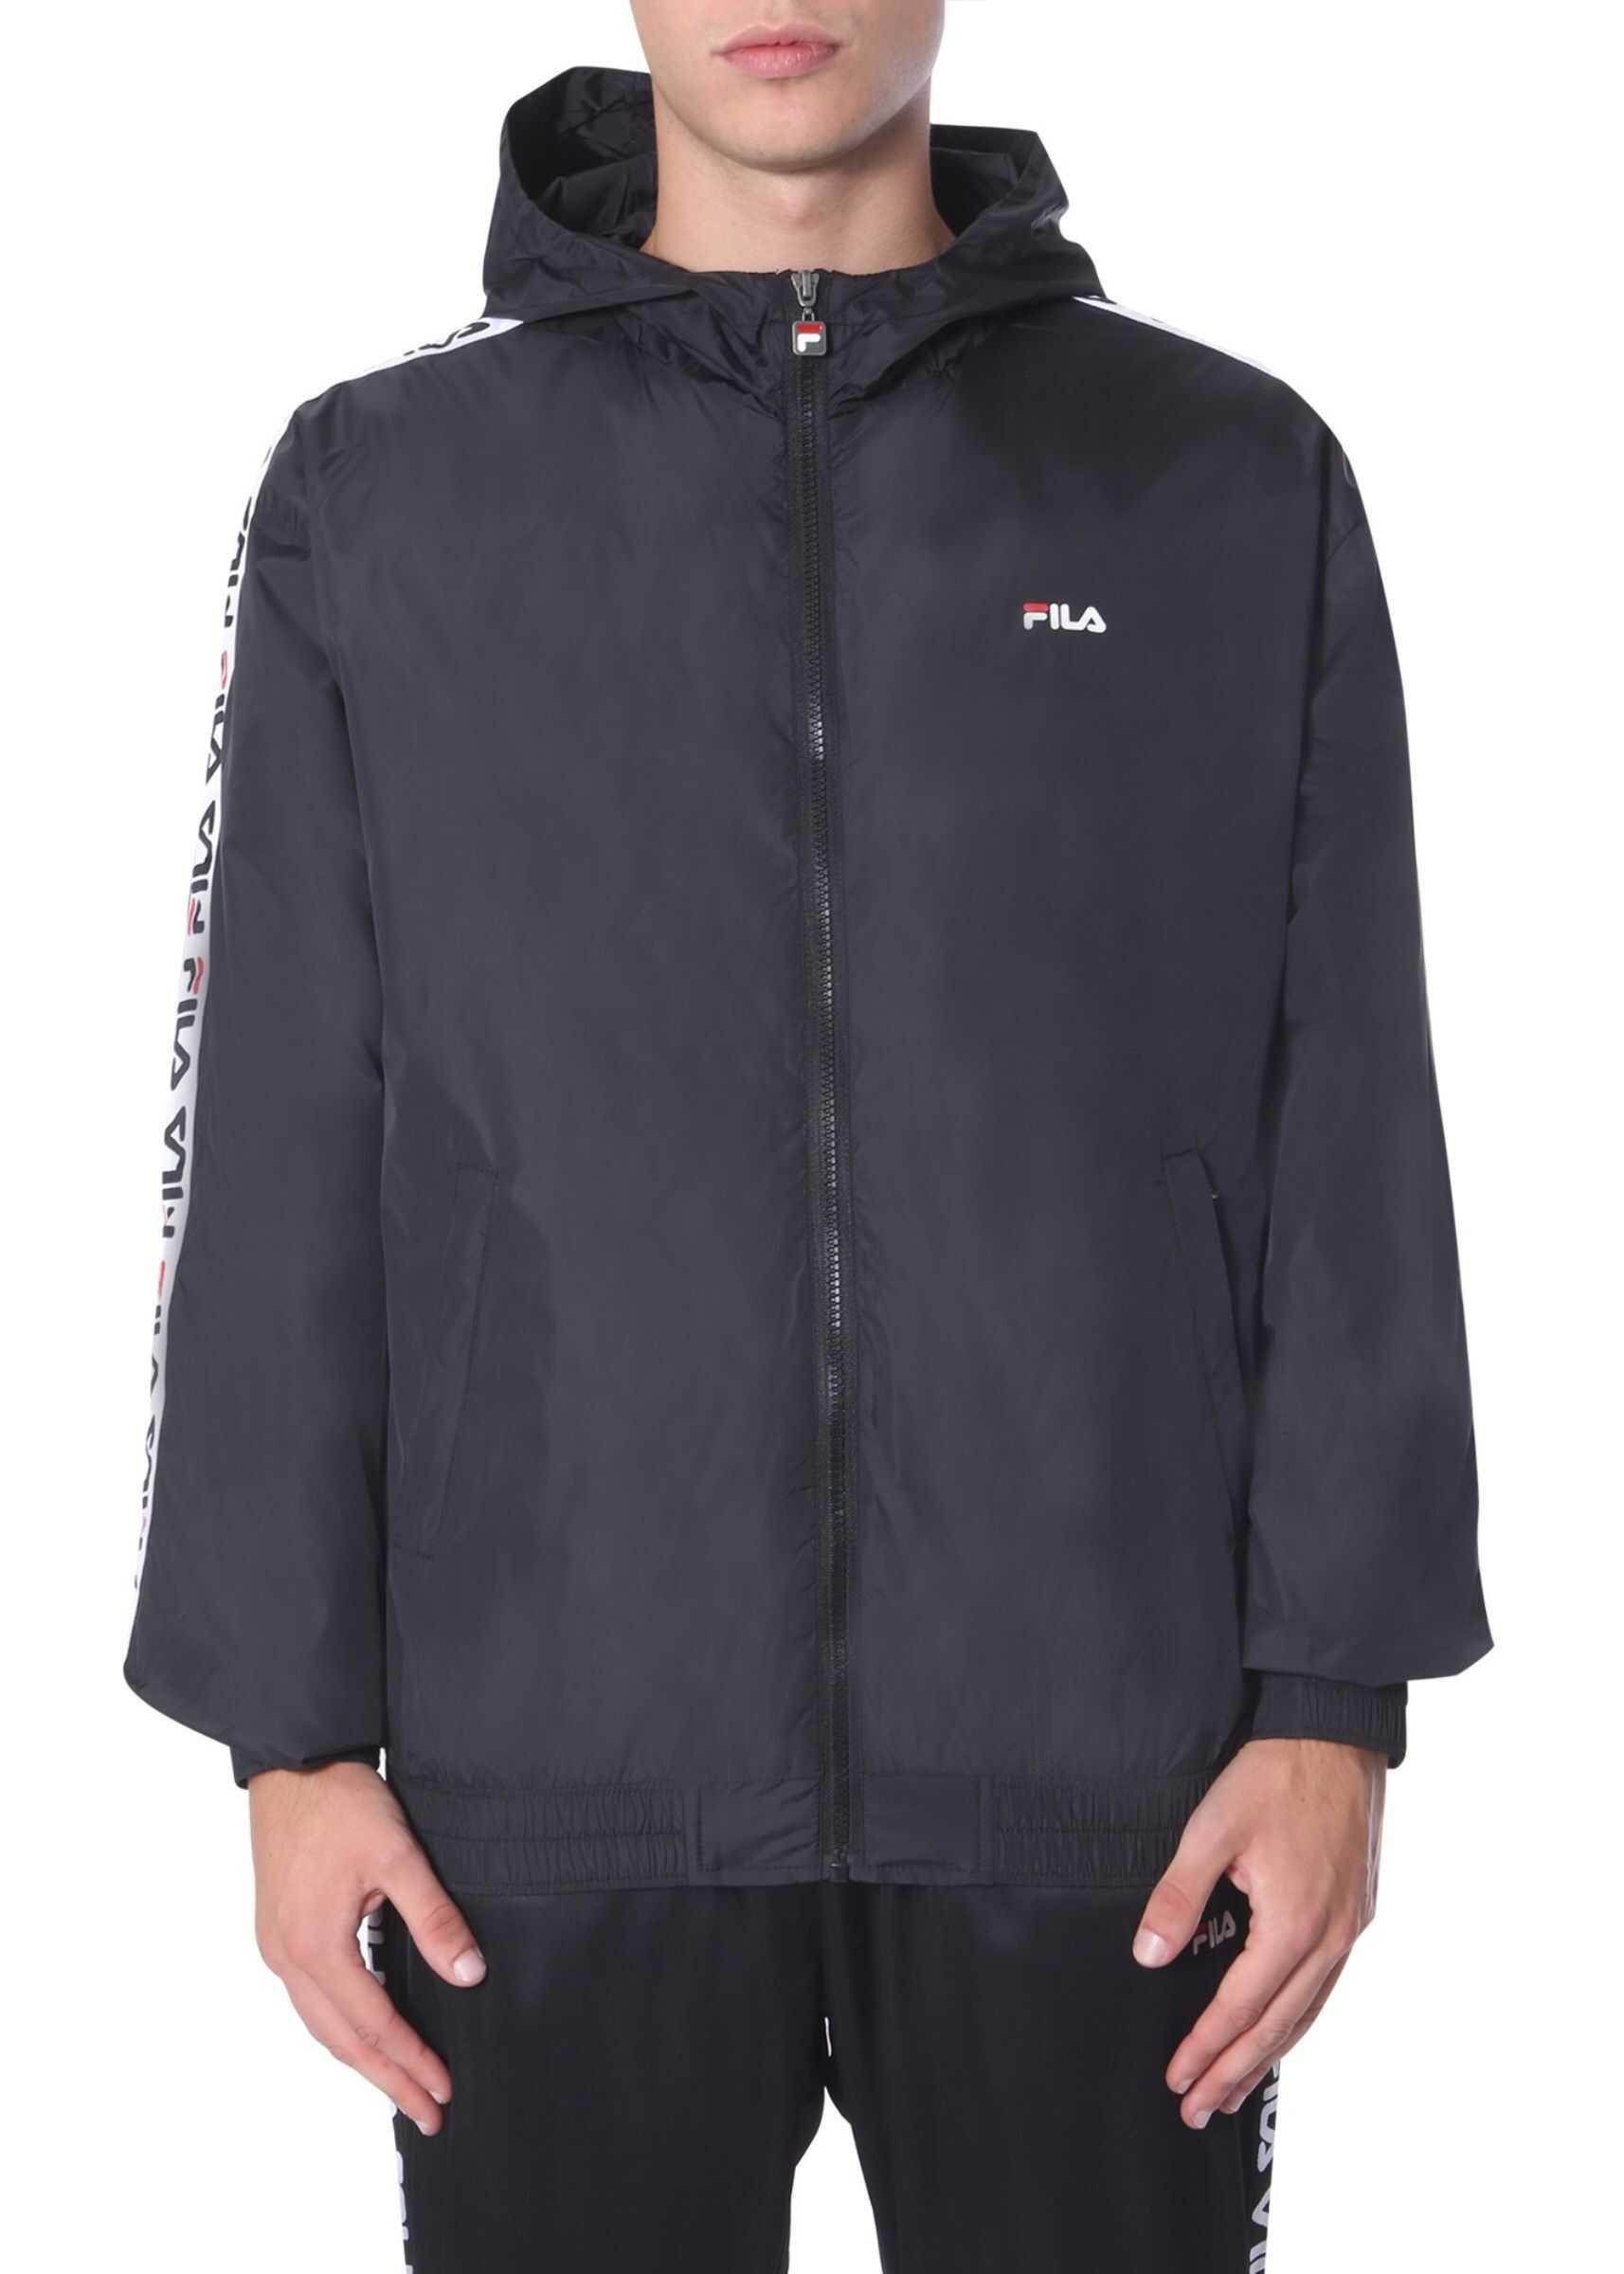 Fila Wind Jacket BLACK